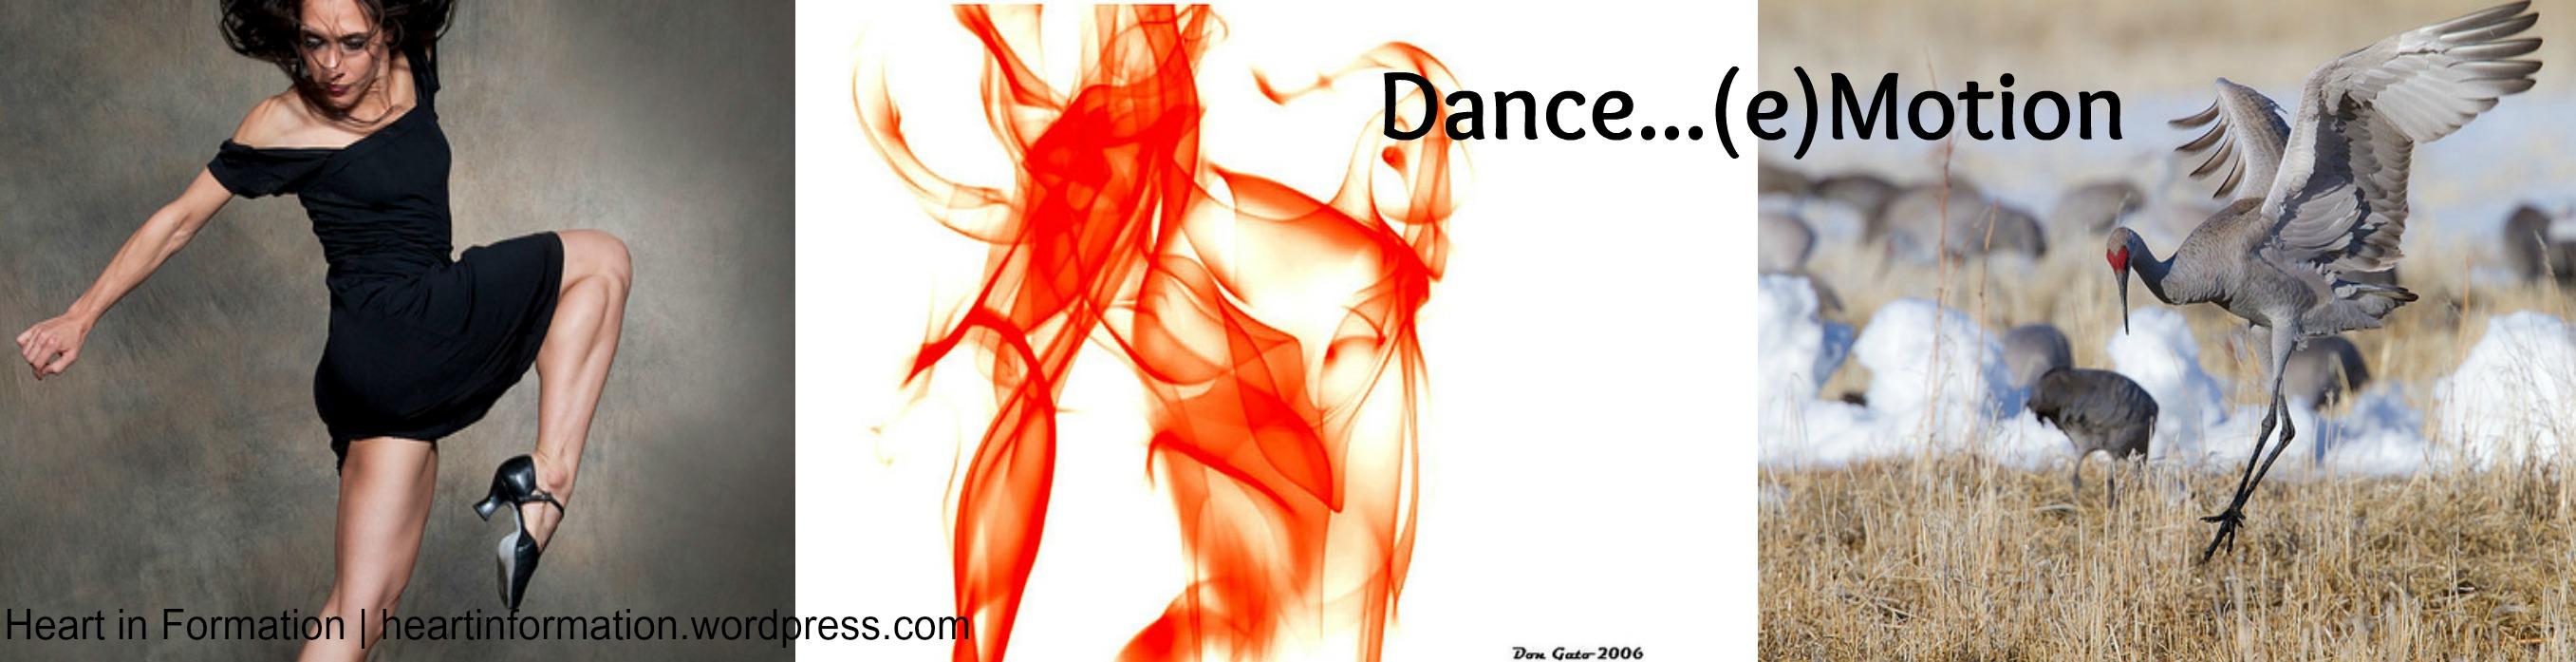 Dance-trio title Dance is eMotion